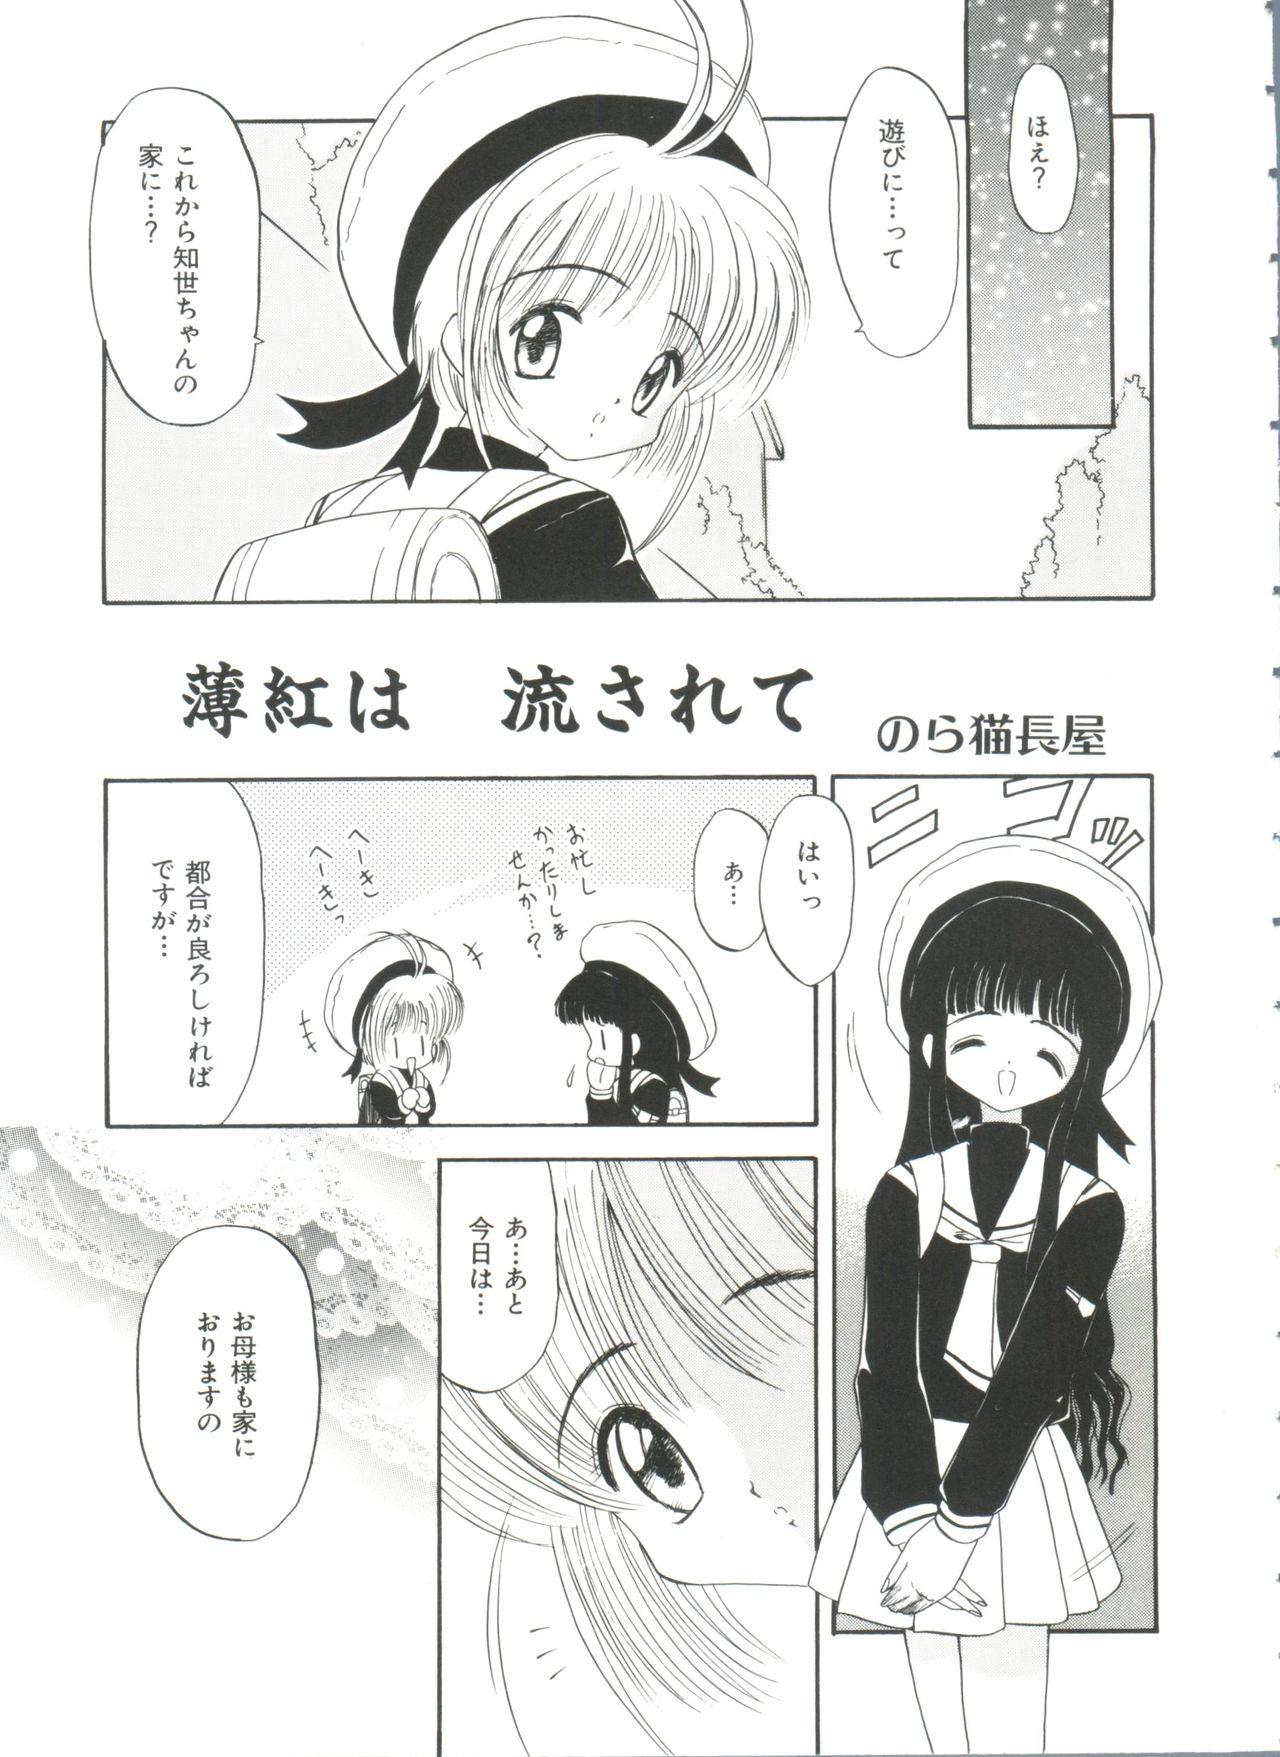 Ero-chan to Issho 32